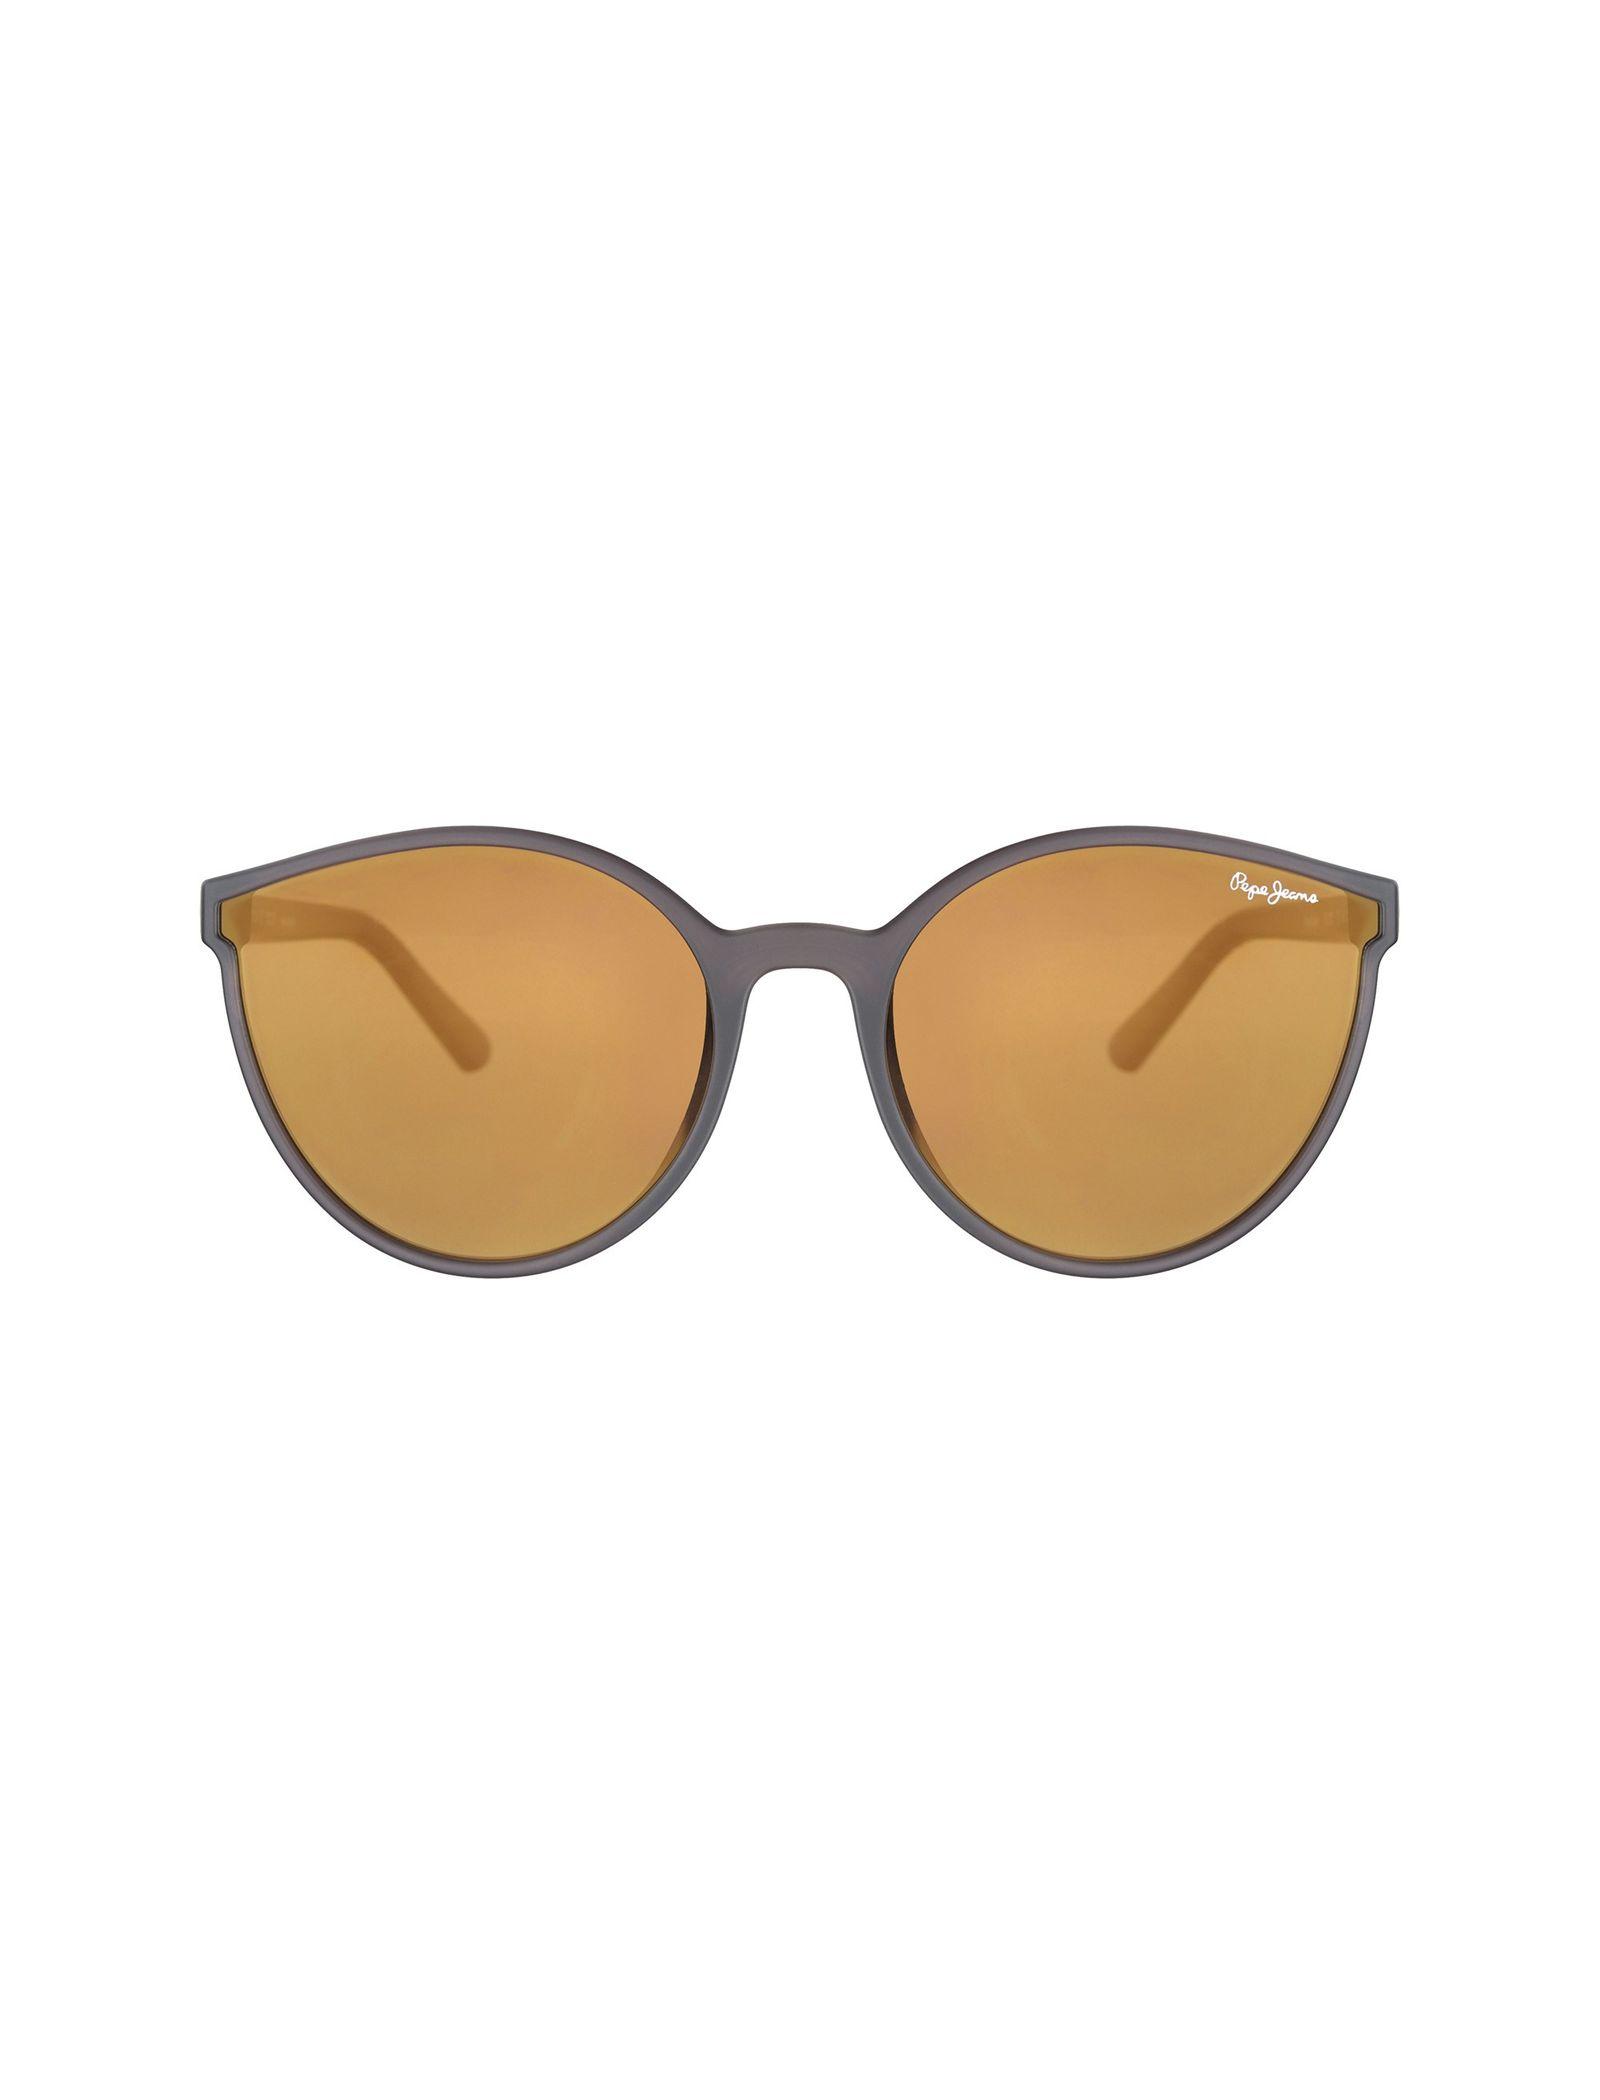 عینک آفتابی پروانه ای زنانه - پپه جینز - زغالي - 1